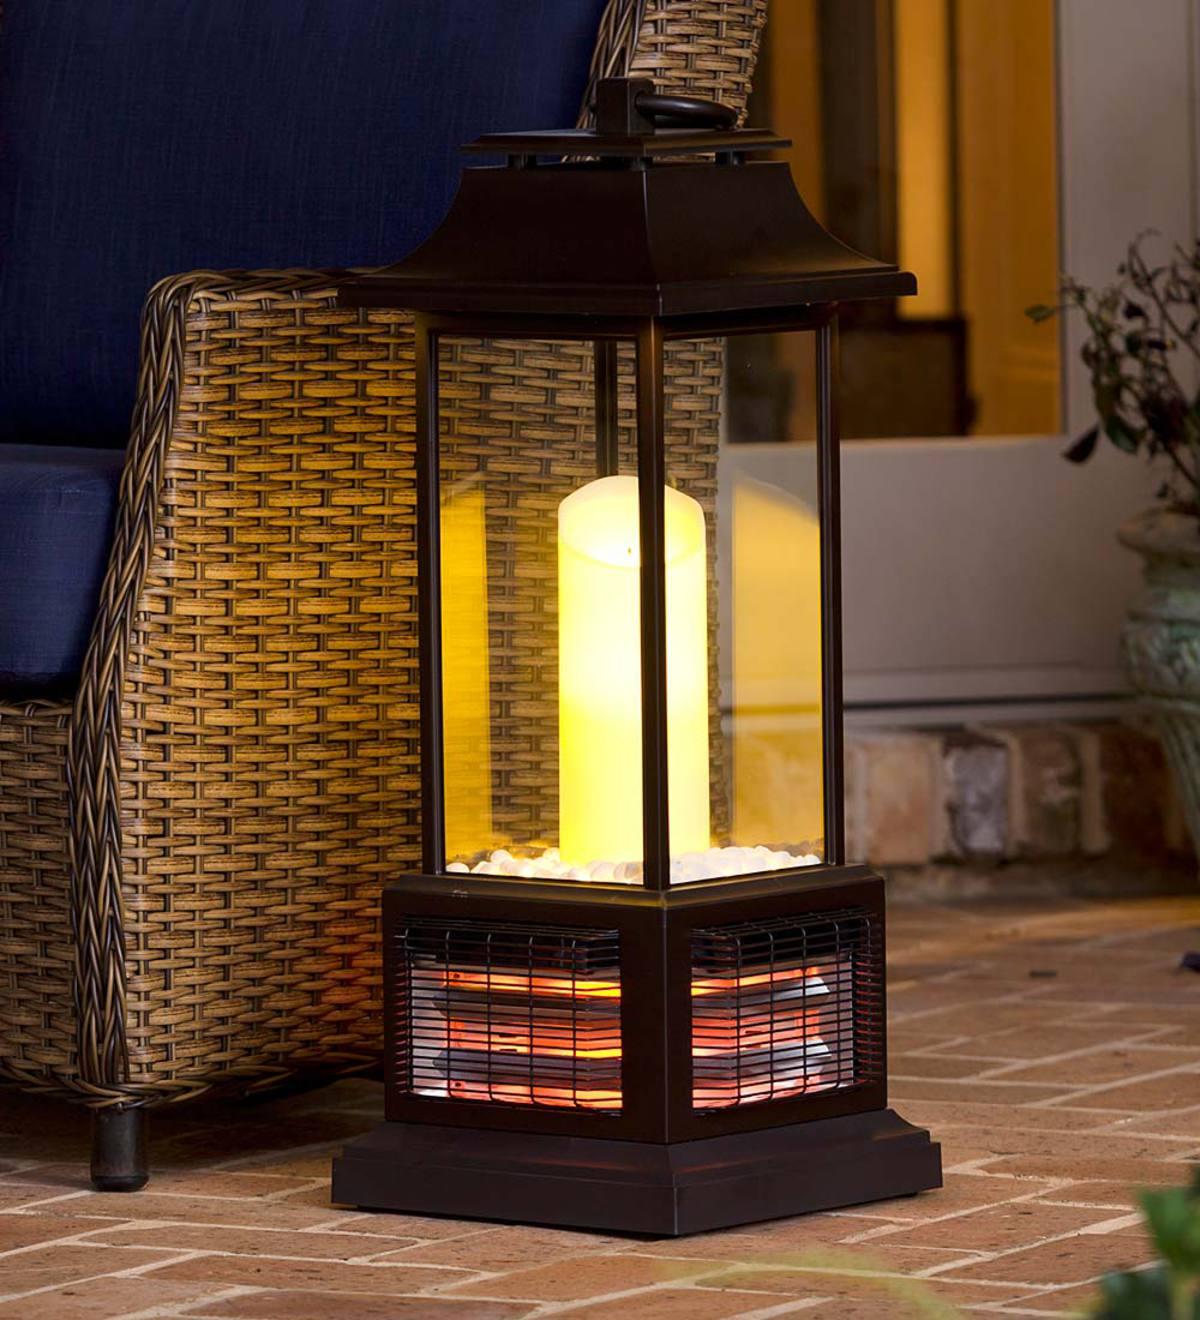 Outdoor Infrared Lantern Heater Bronze Plowhearth